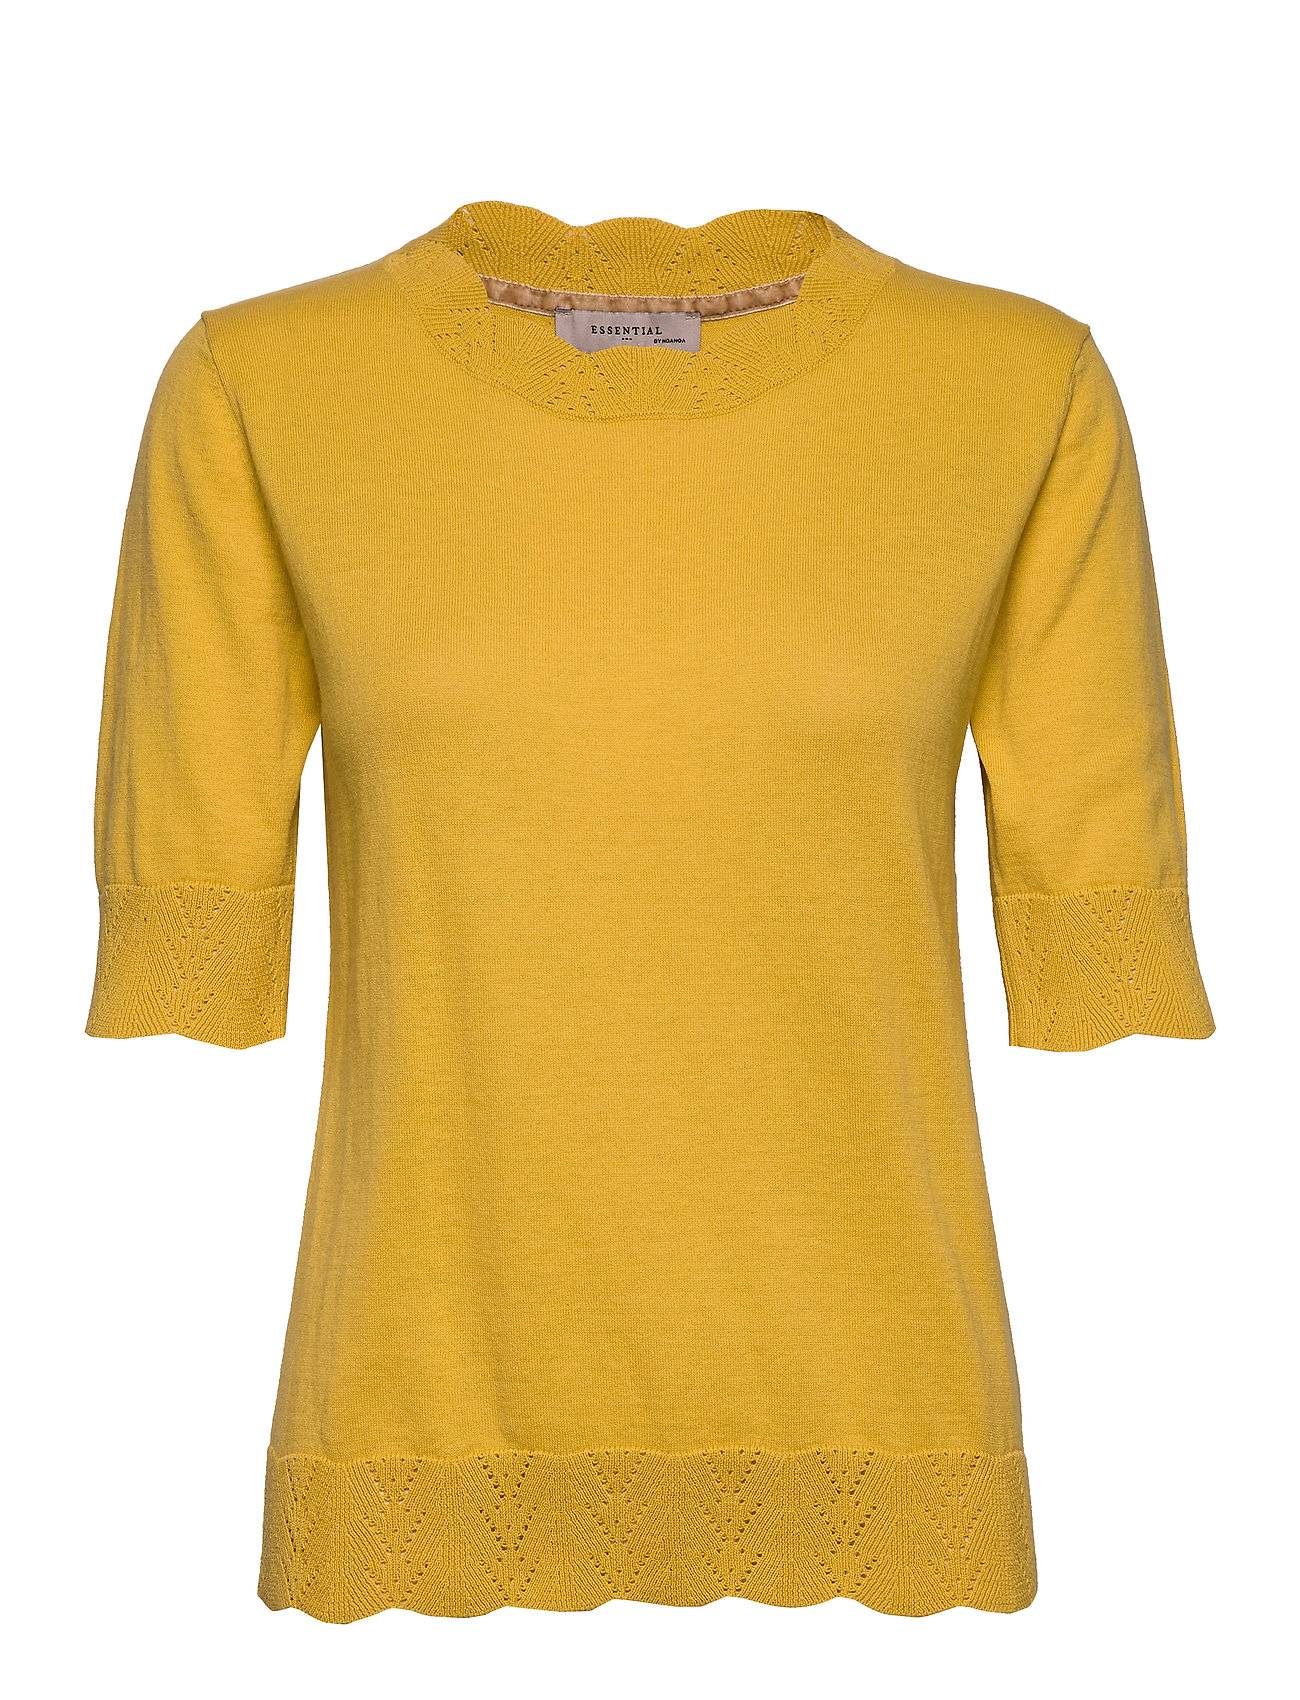 Noa Noa Pullover T-shirts & Tops Knitted T-shirts/tops Keltainen Noa Noa